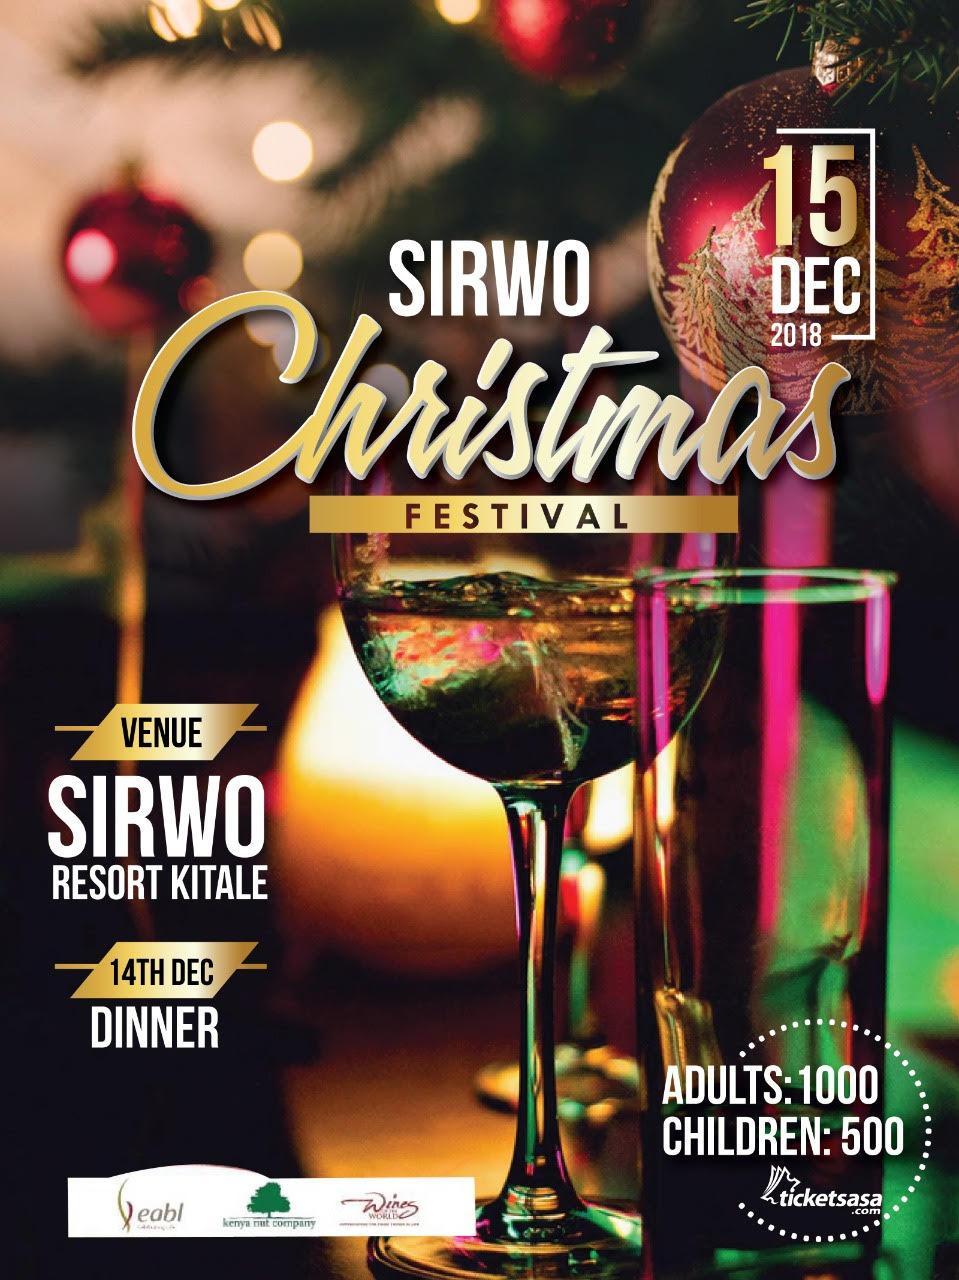 Sirwo Christmas Festival